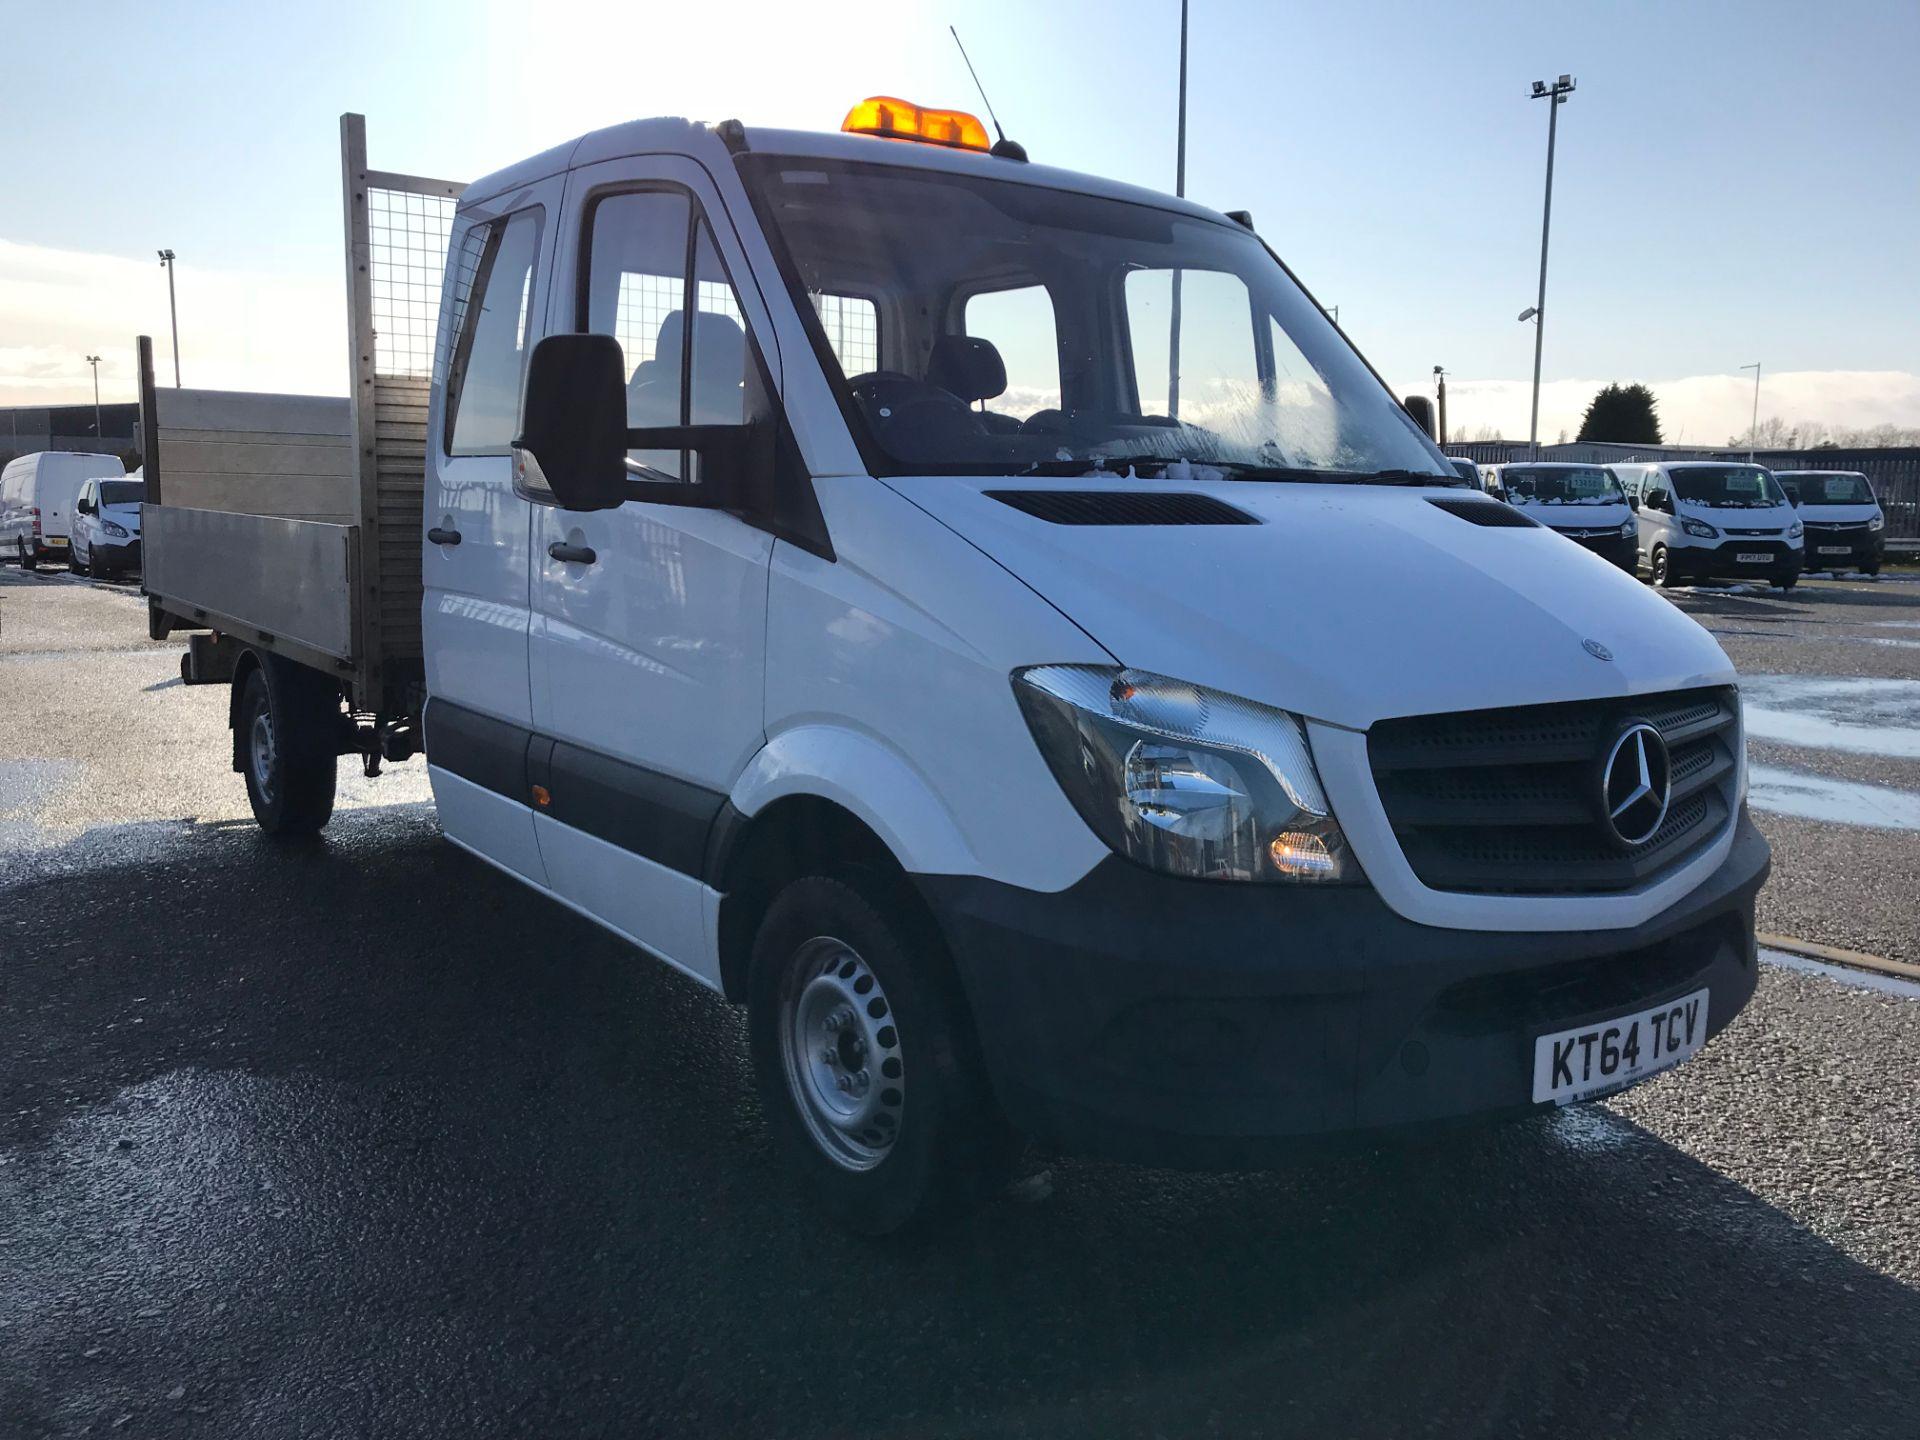 2015 Mercedes-Benz Sprinter 3.5T Crew Cab (KT64TCV)